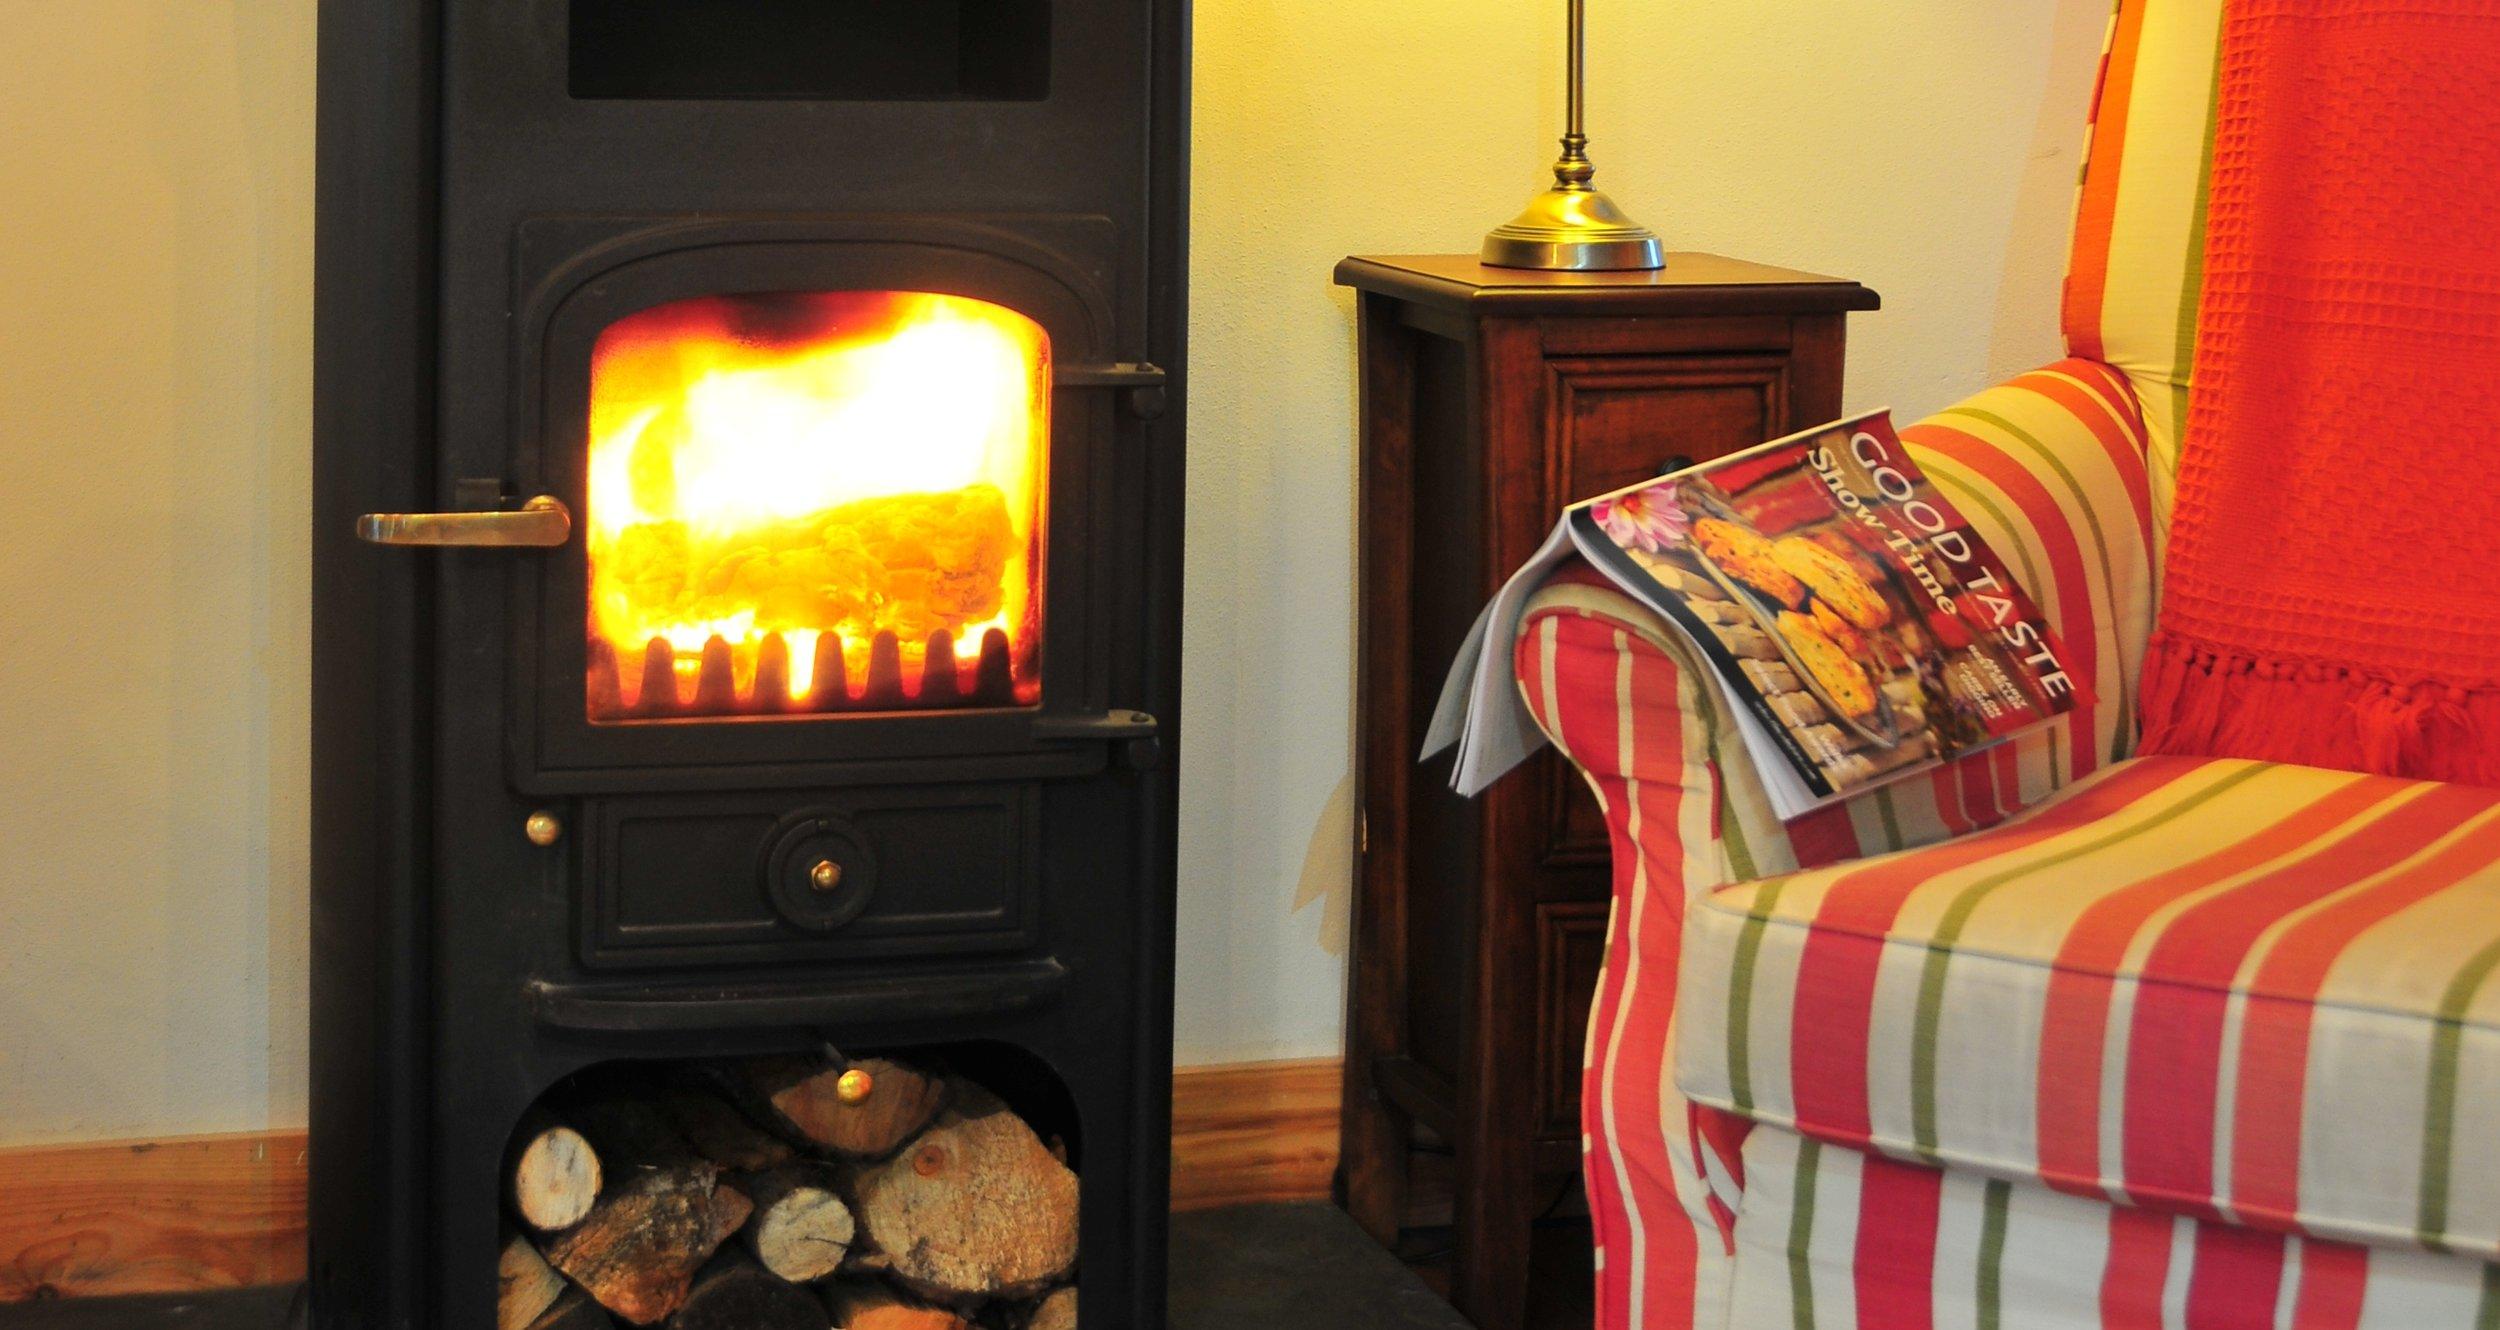 Hayloft Living Room - Woodburning Stove 2.JPG